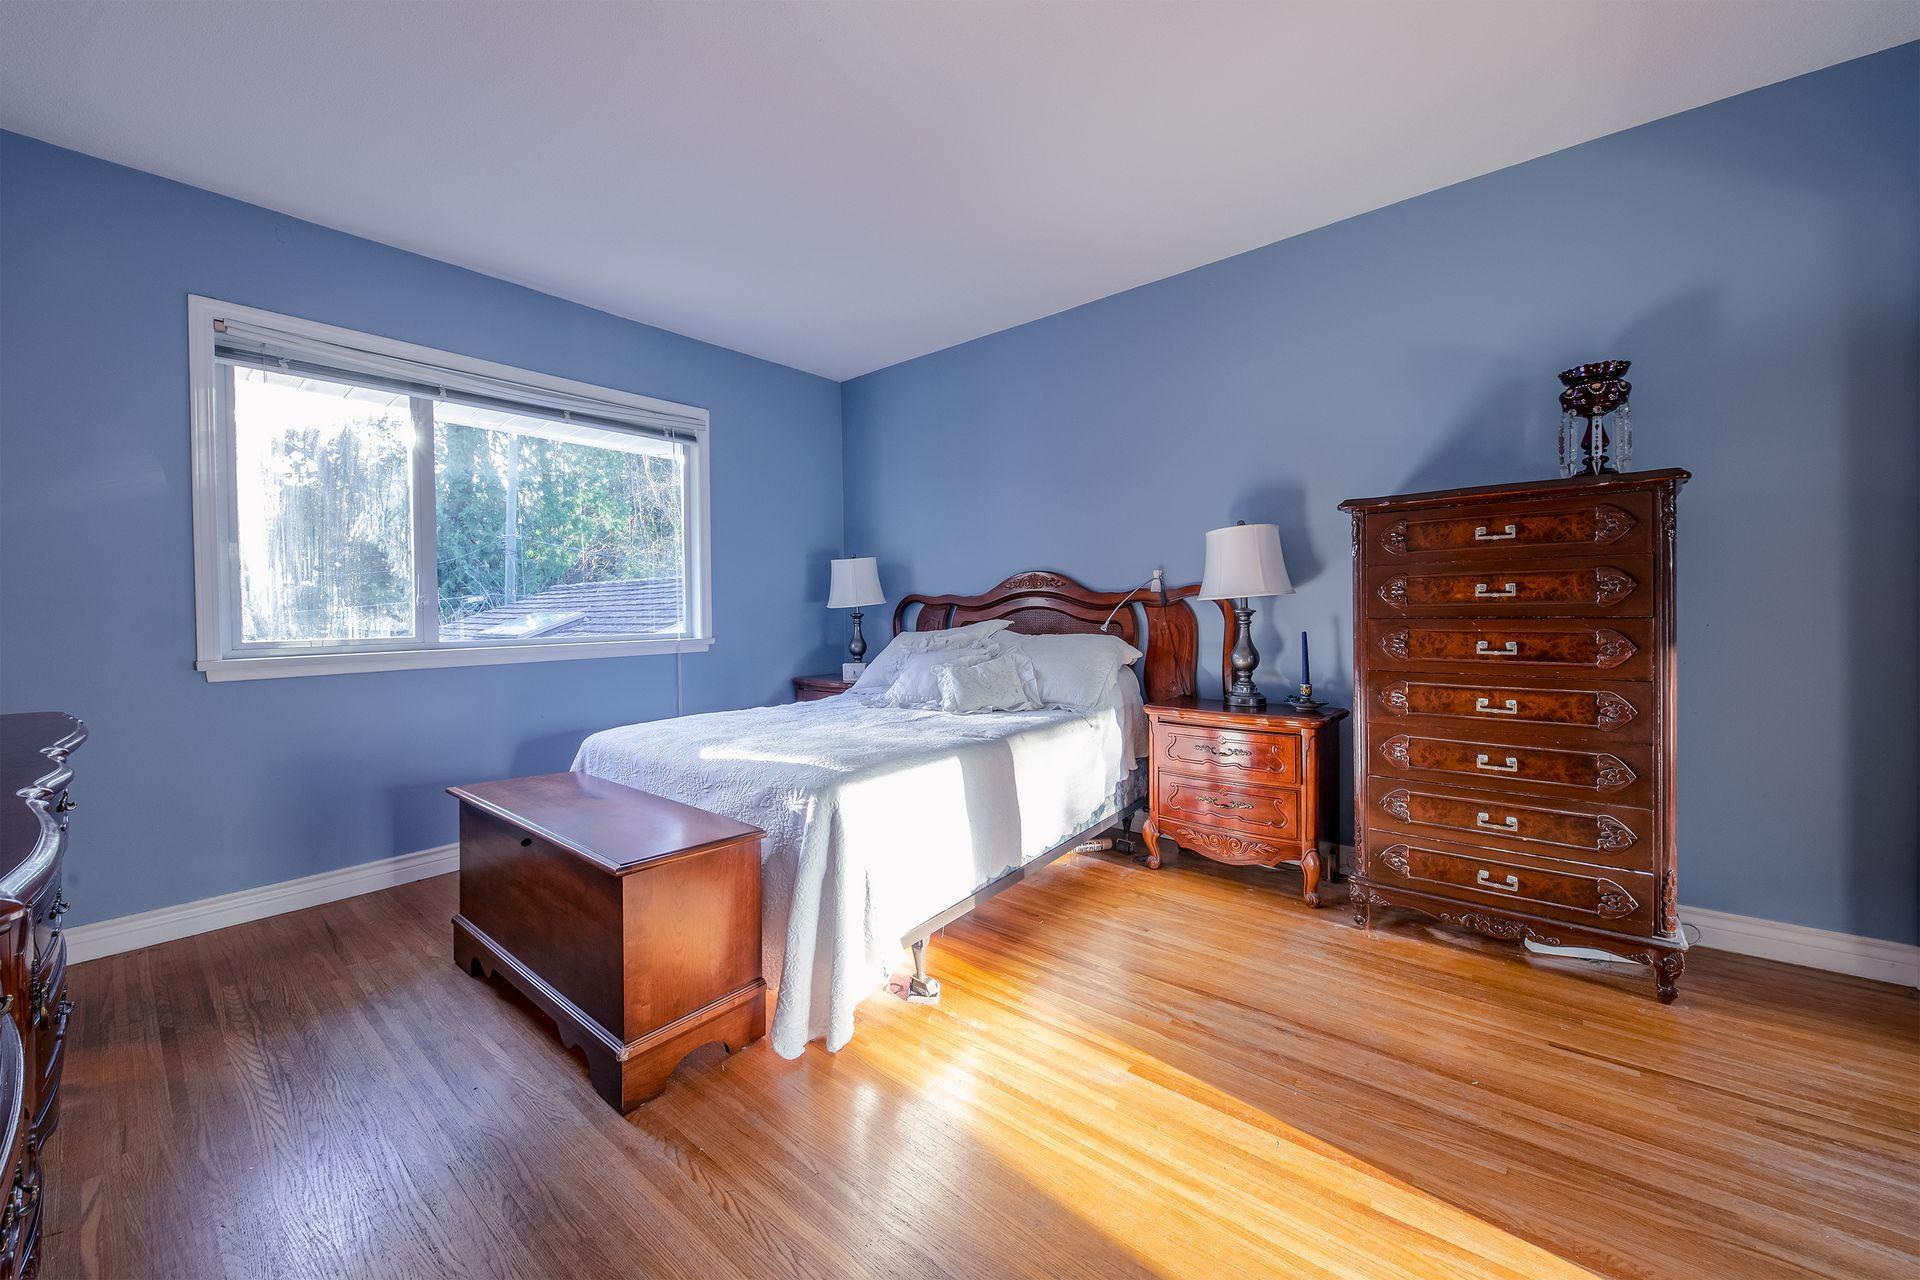 bedroom_001 at 1645 Taylor Way, British Properties, West Vancouver